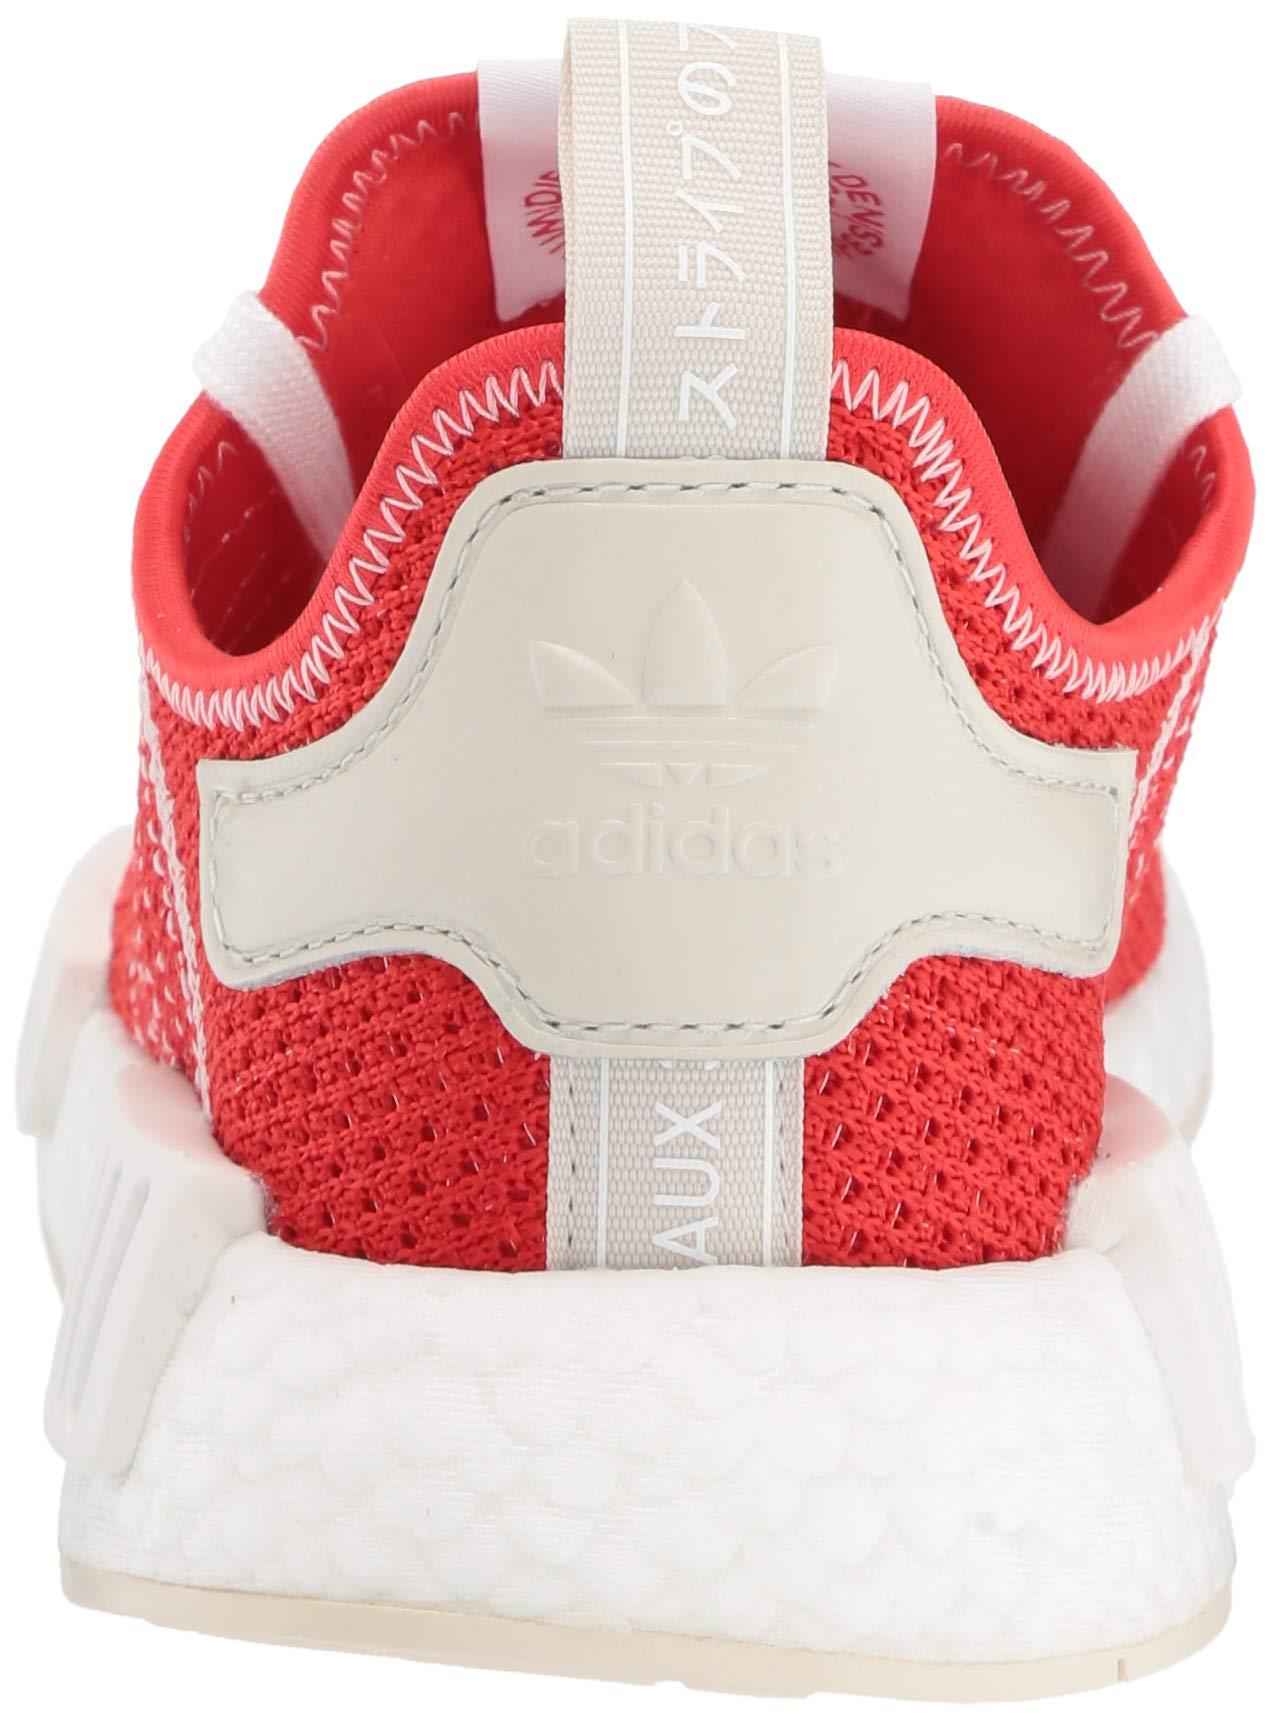 adidas Originals Men's NMD_R1 Running Shoe, Active red/Ecru Tint, 4 M US by adidas Originals (Image #2)